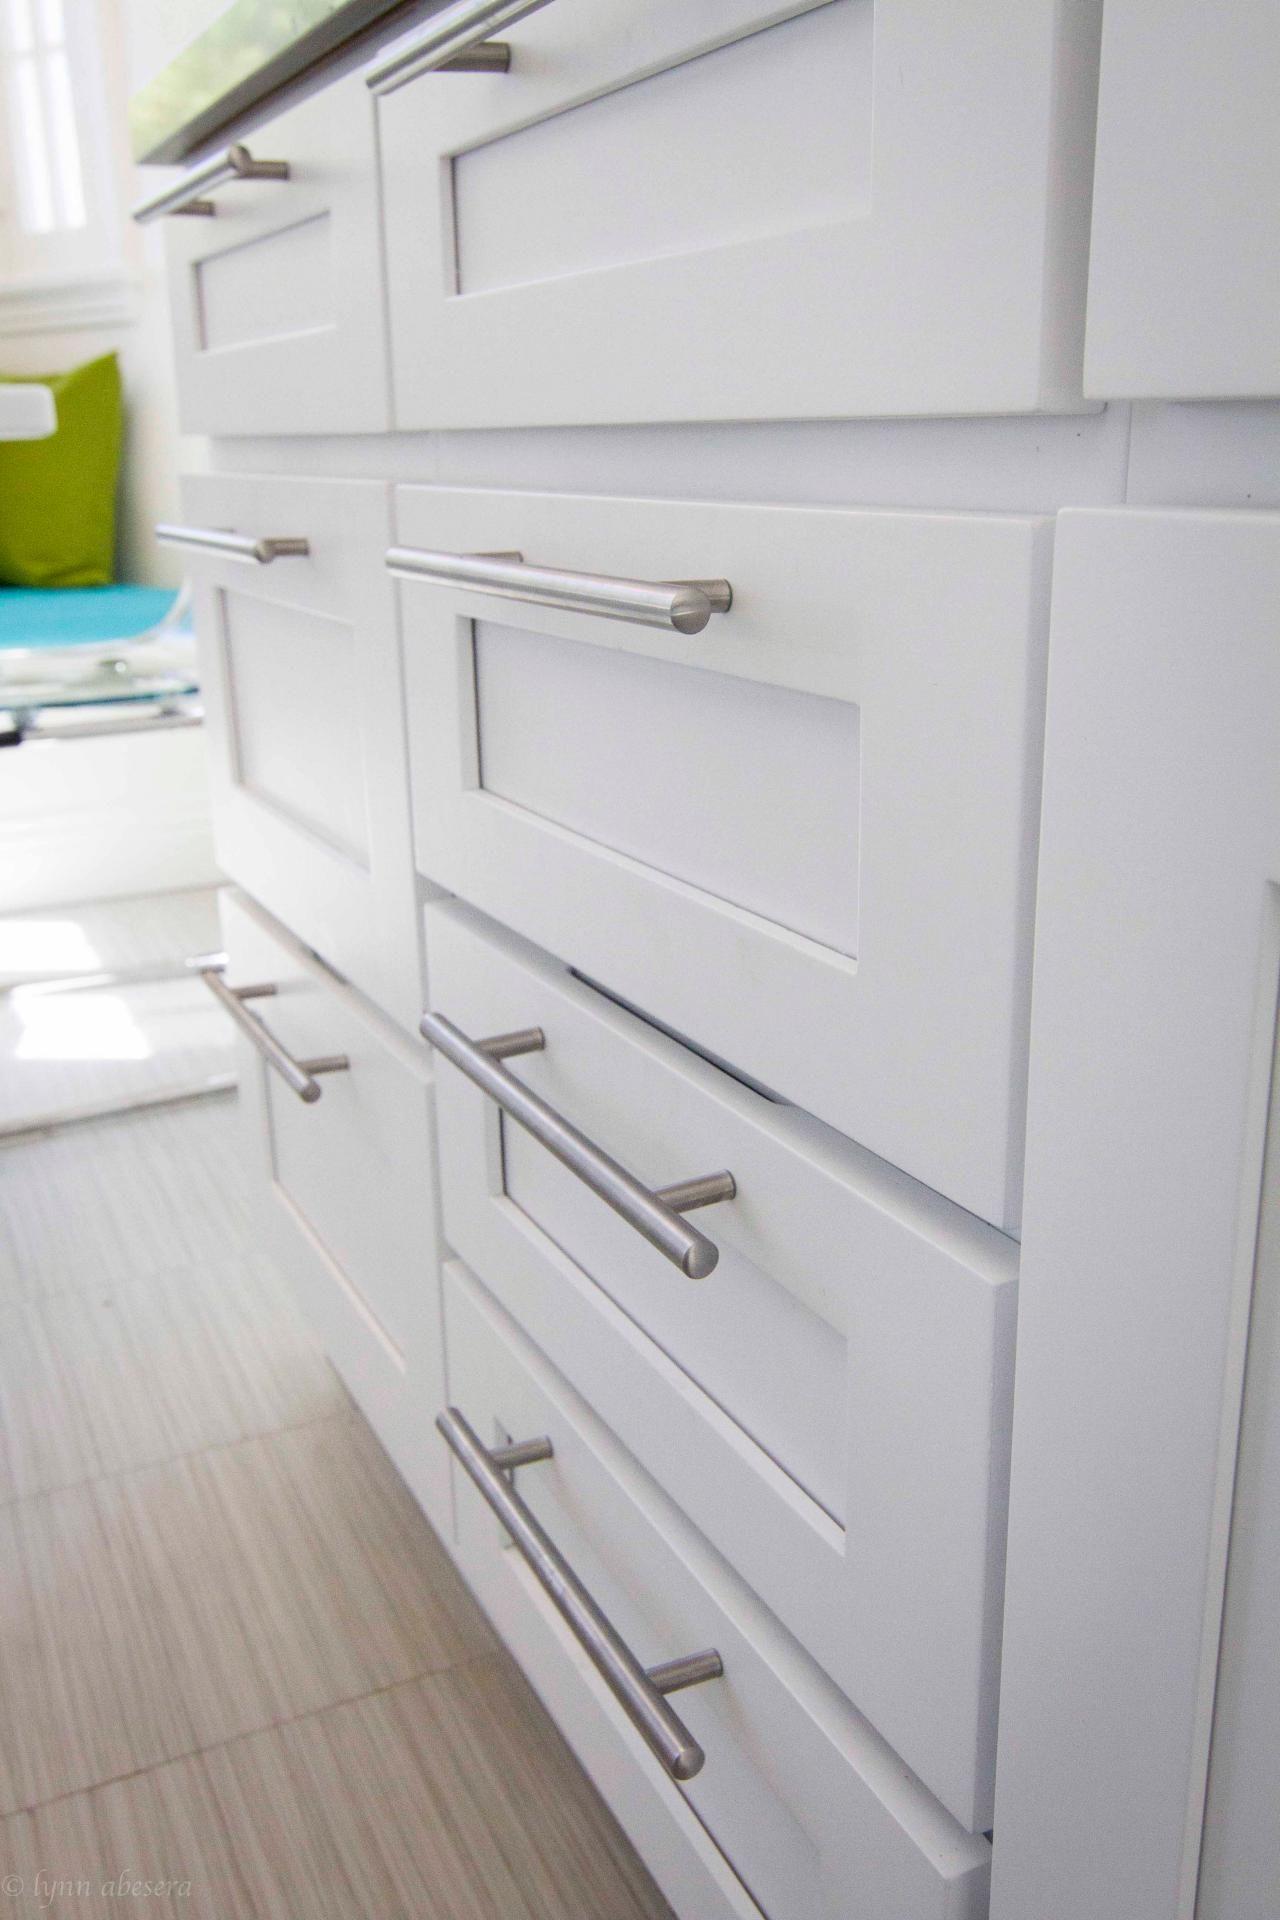 Contemporary Nickel Drawer Pulls In White Kitchen